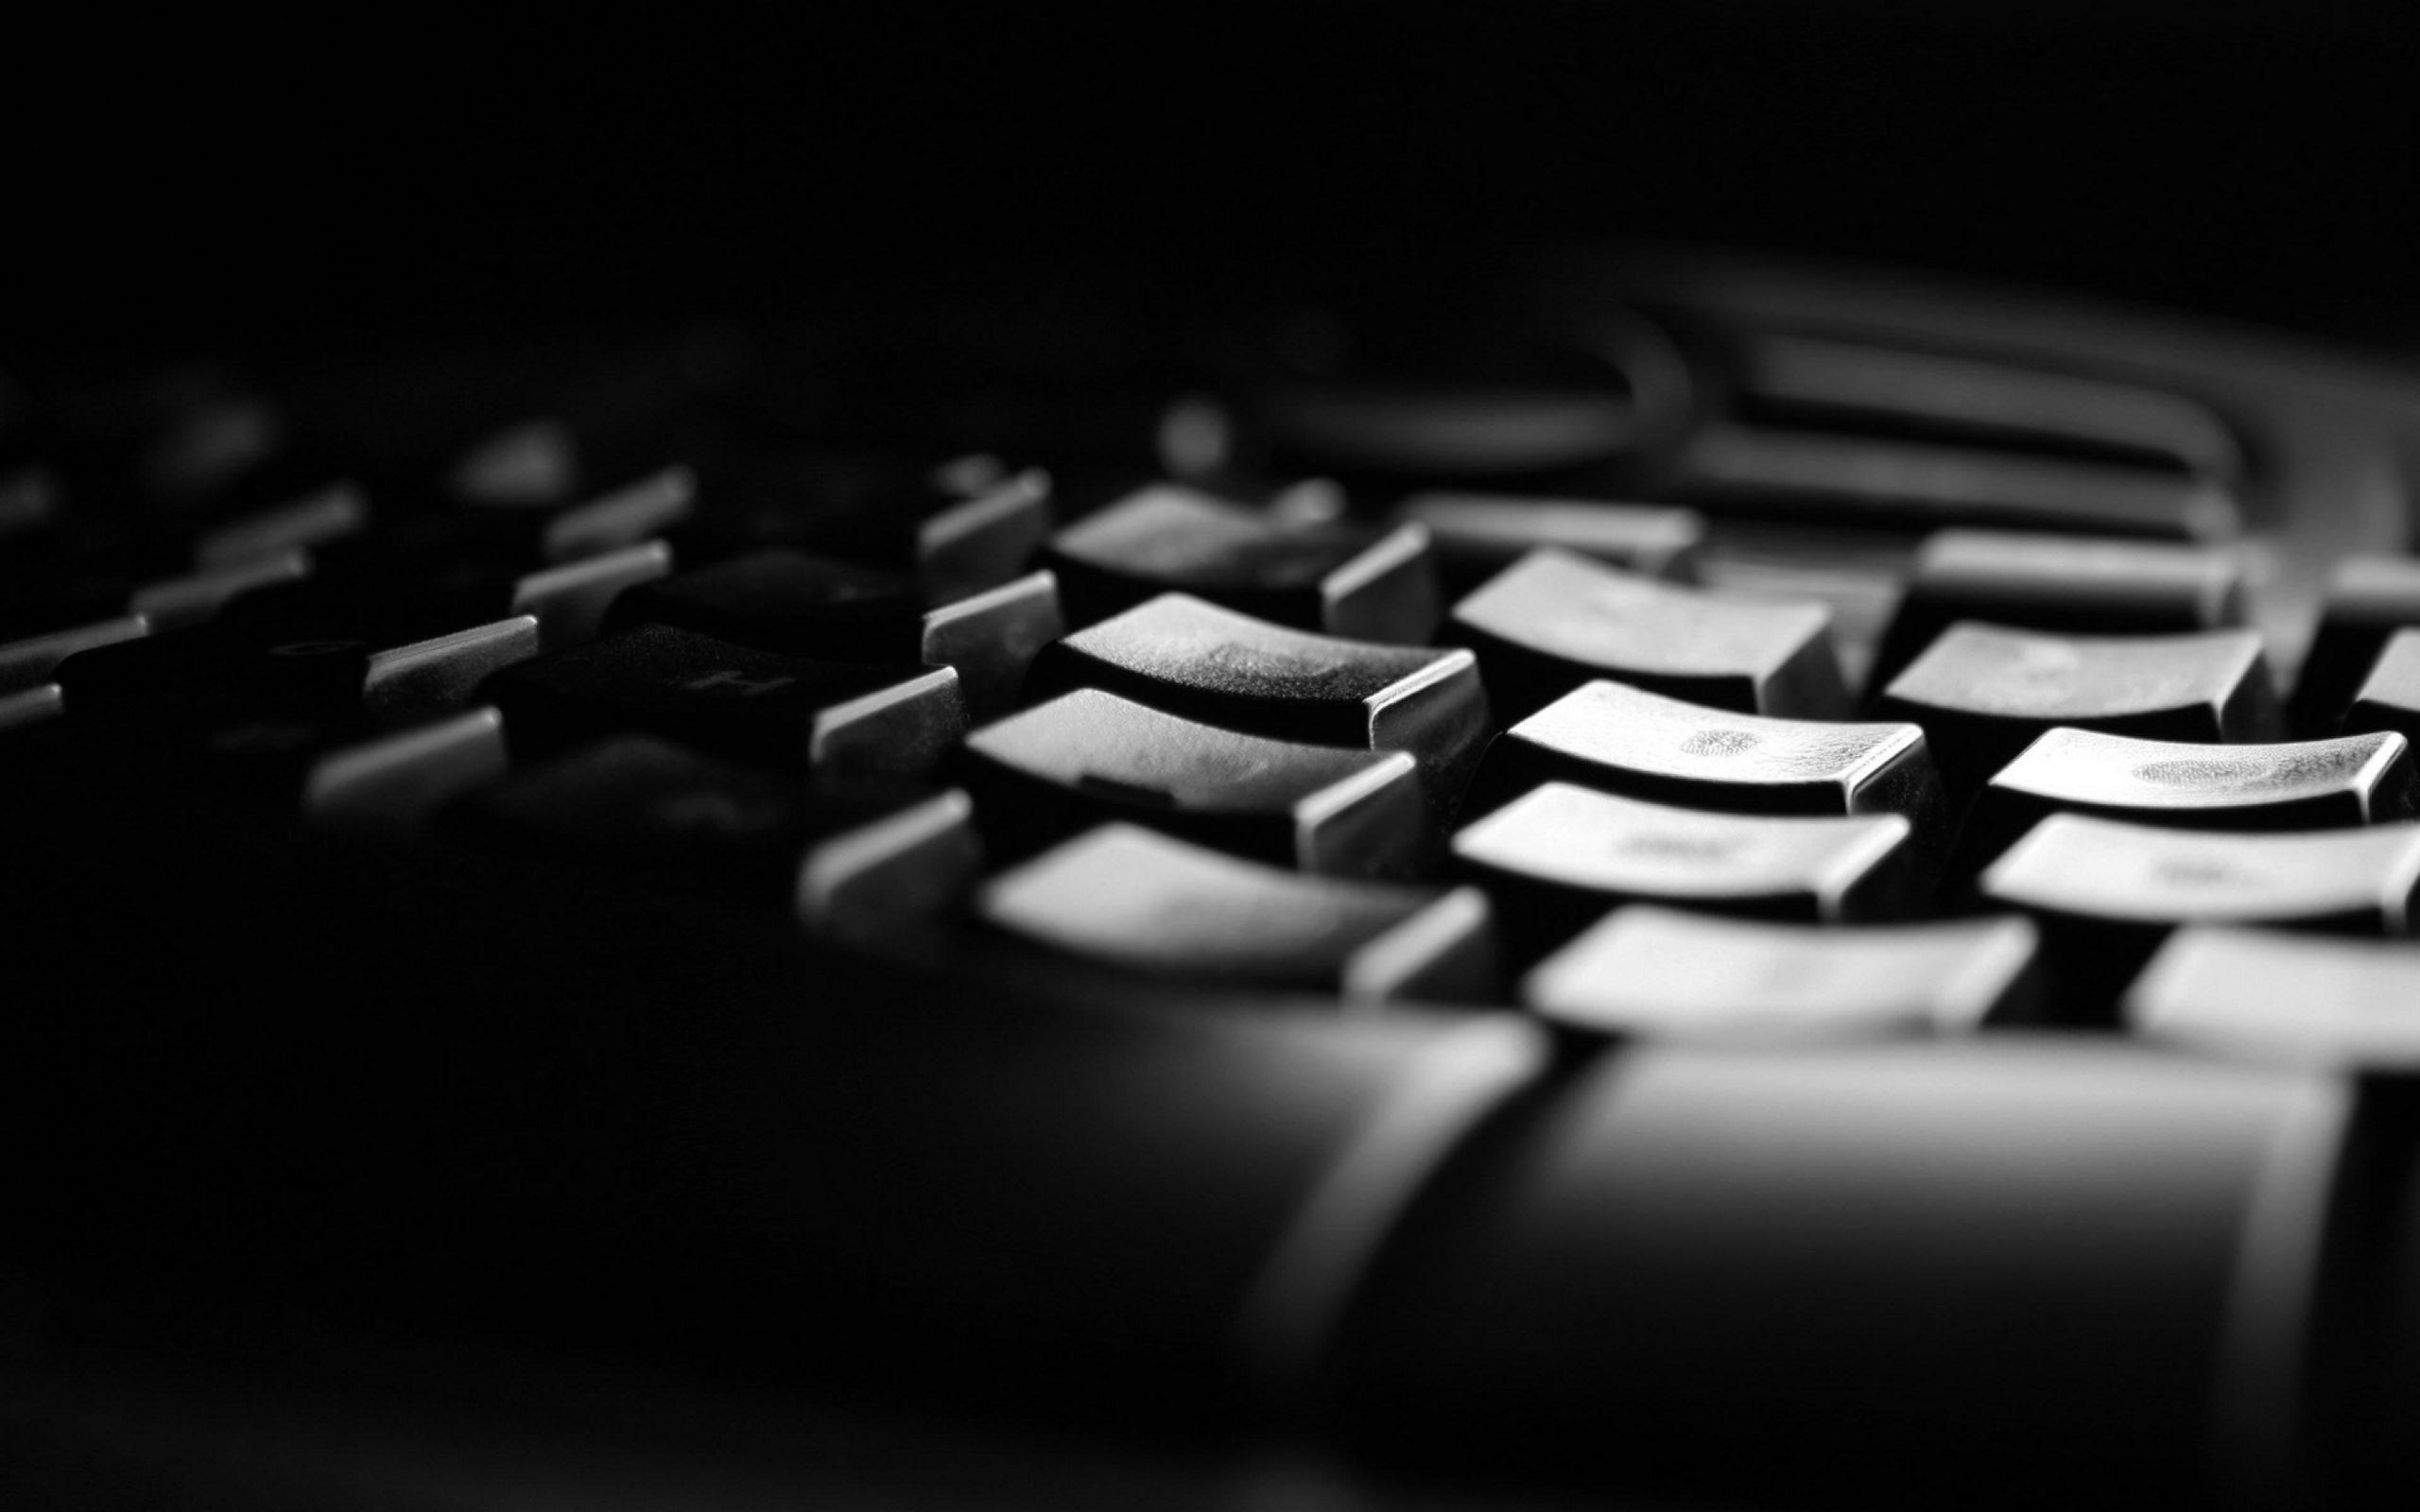 image of computer keyboard 4k